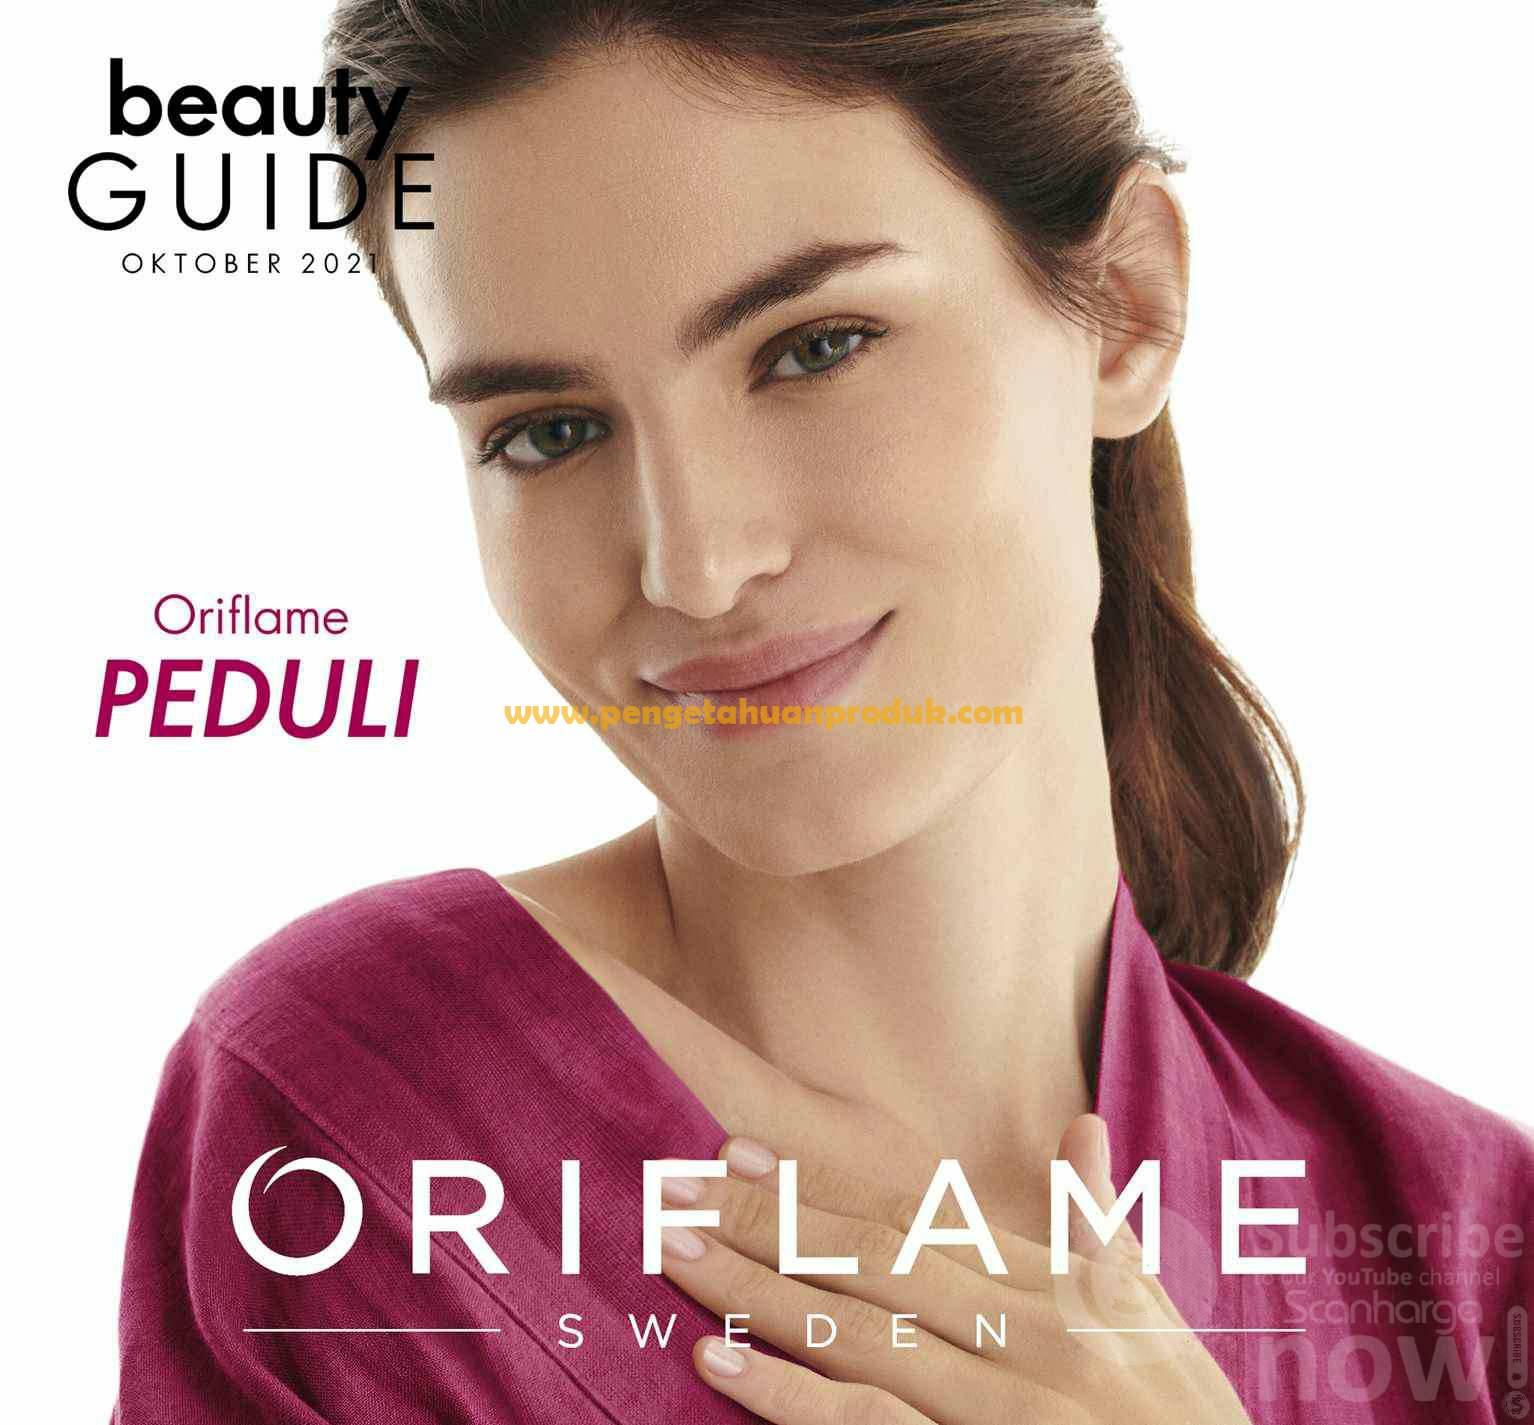 Katalog Promo Oriflame Terbaru Oktober 2021